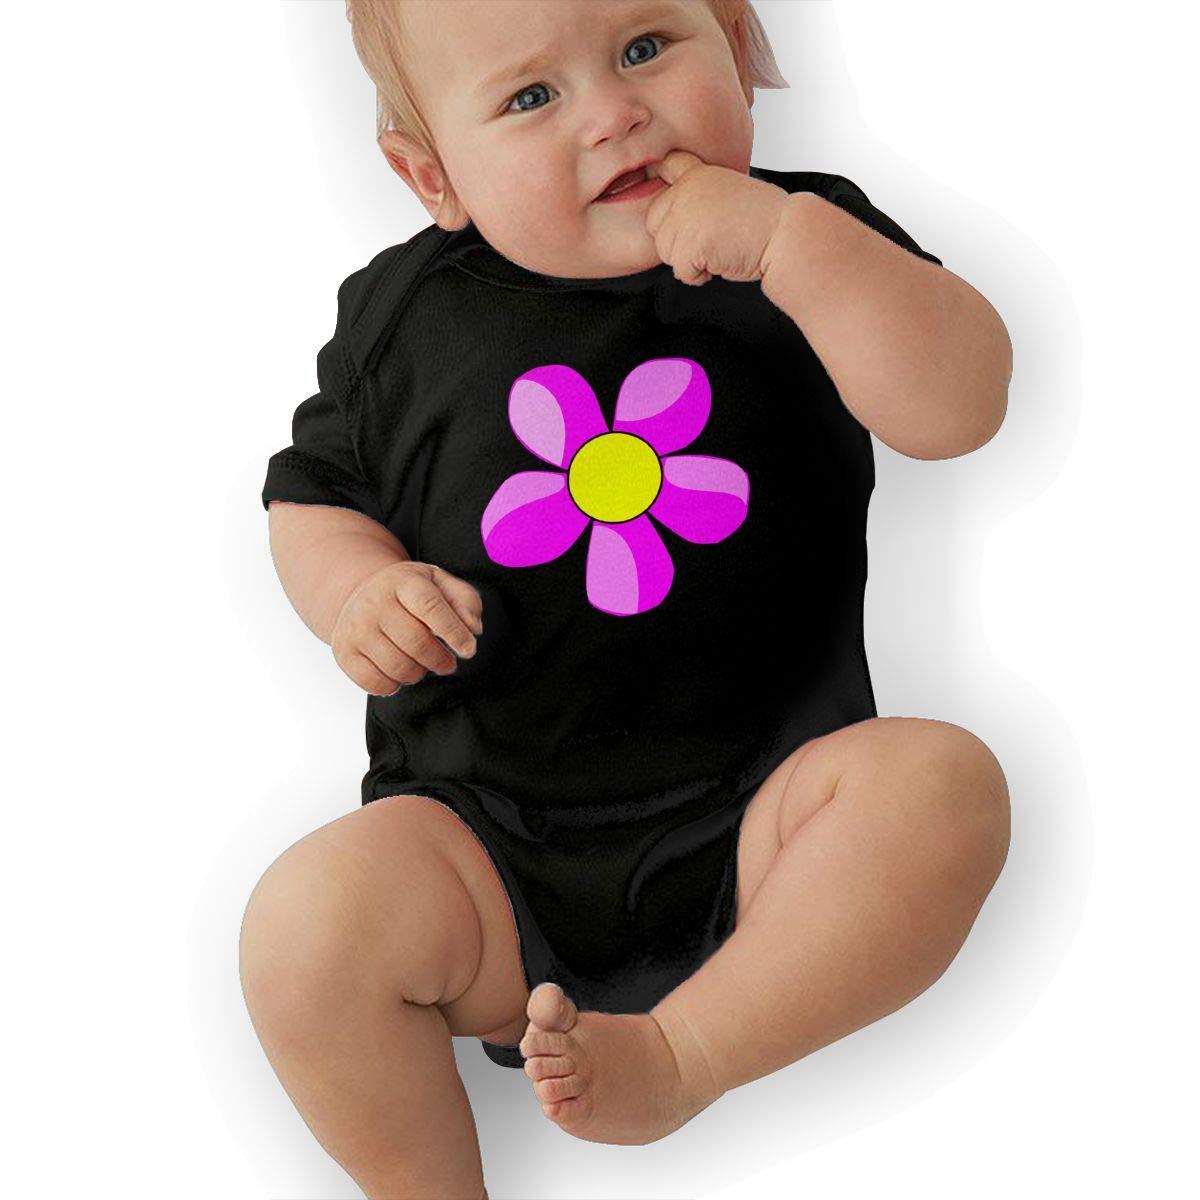 Baby Boys Rainbow Flower Wreath Vector Clip Art Short Sleeve Climbing Clothes Bodysuits Suit 6-24 Months